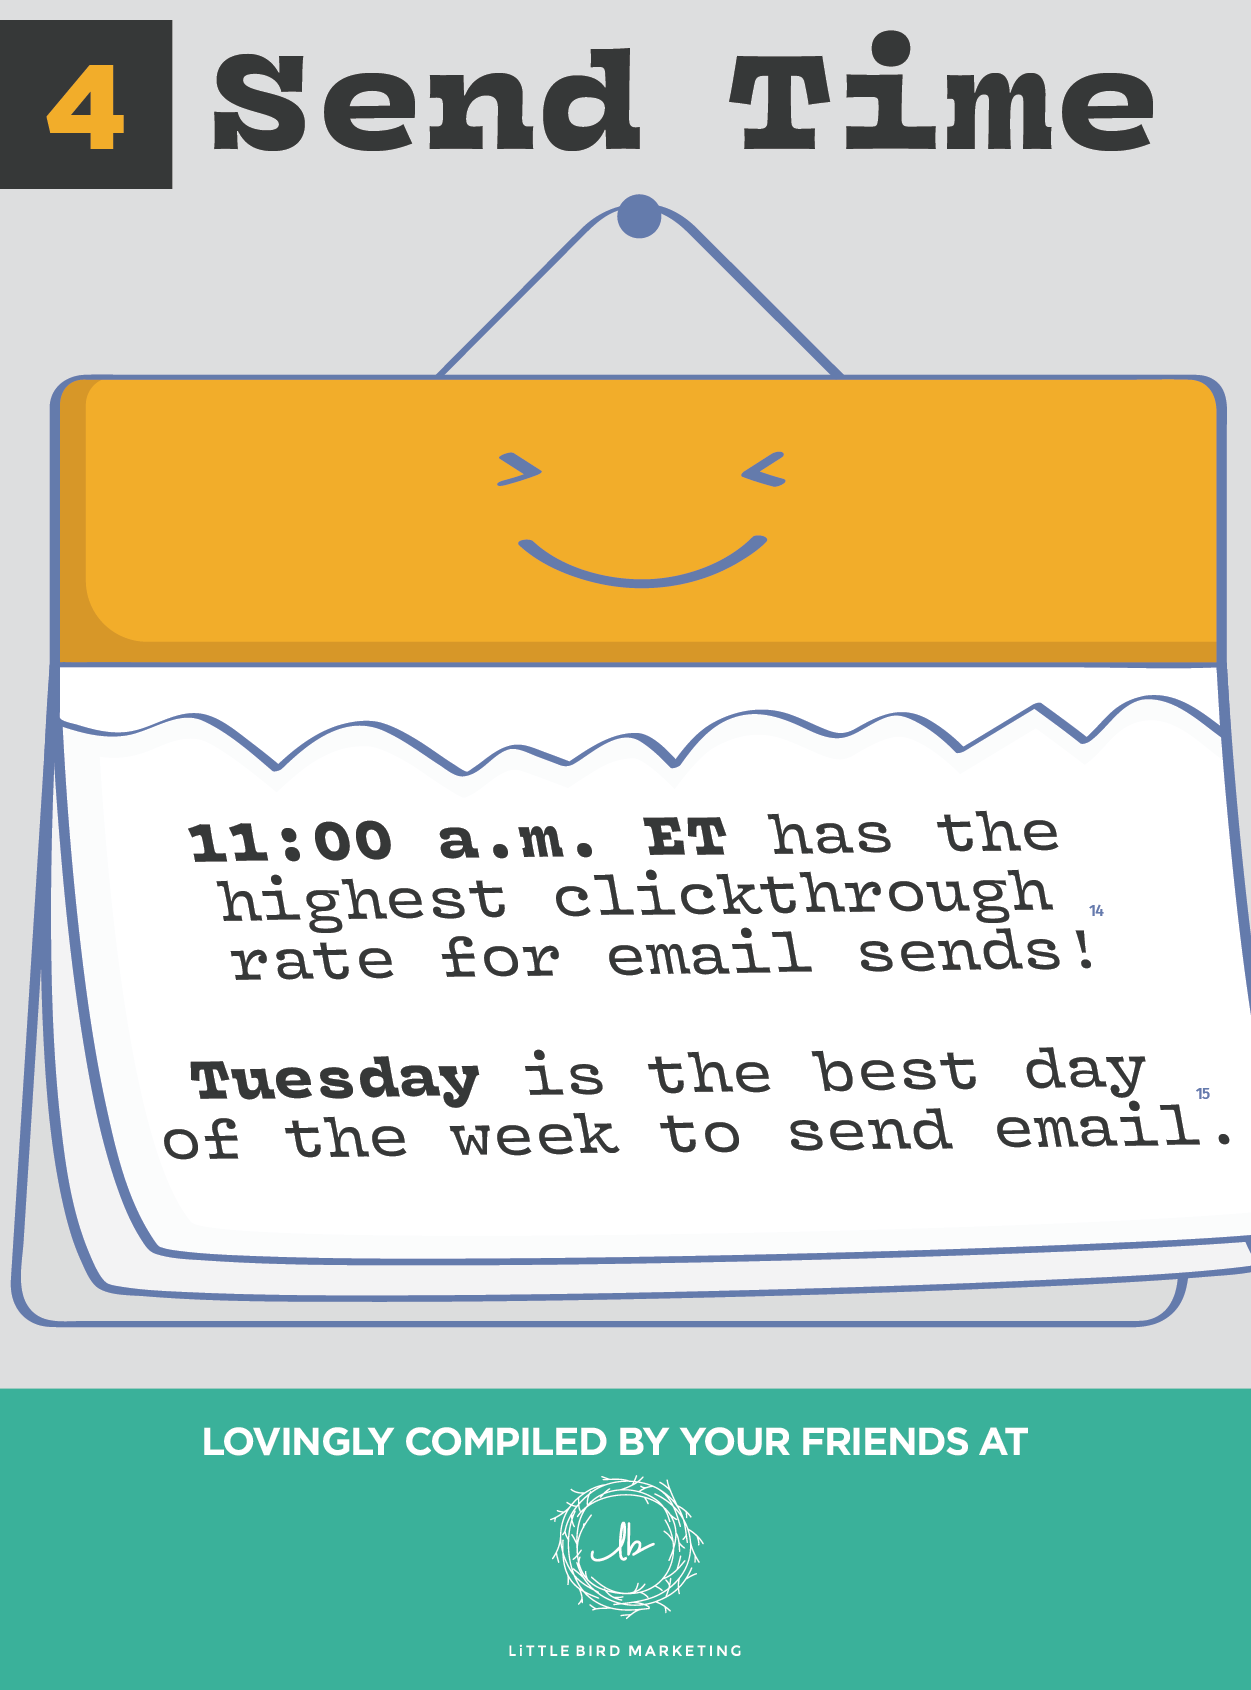 Email Send Time Statistics